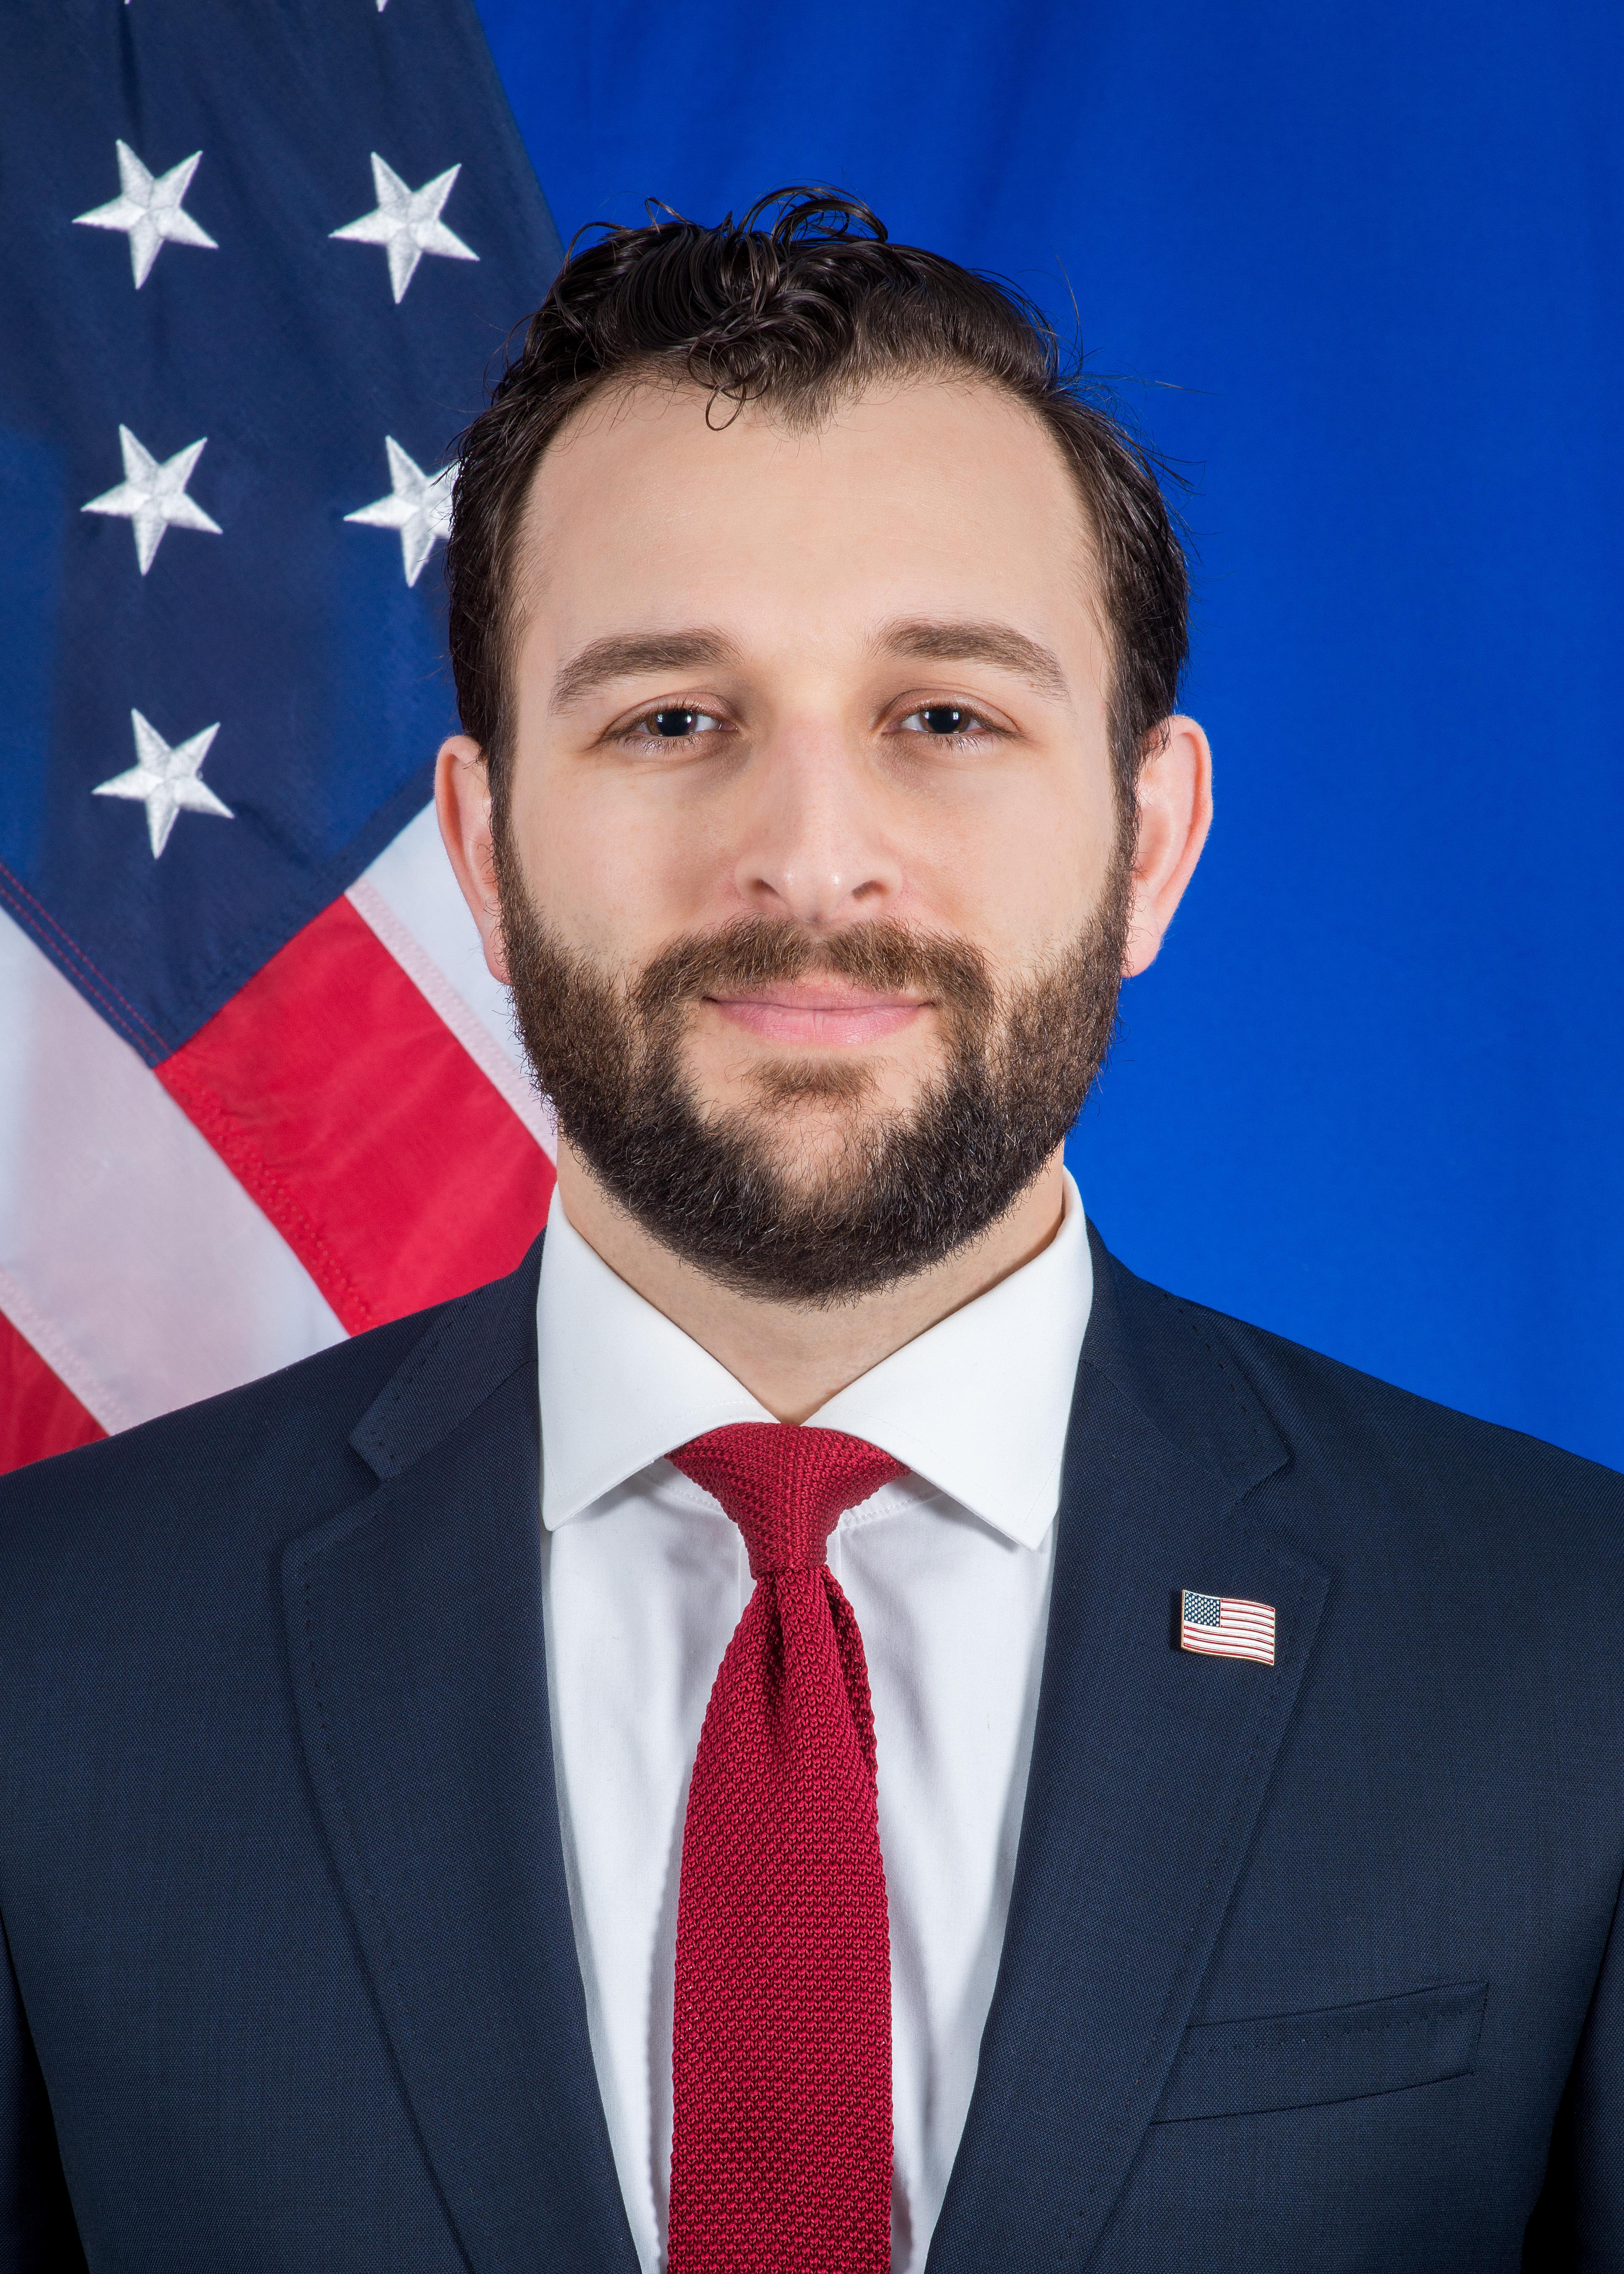 Benjamin Friedmann, Deputy Assistant Secretary for Digital Strategy, Bureau of Global Public Affairs